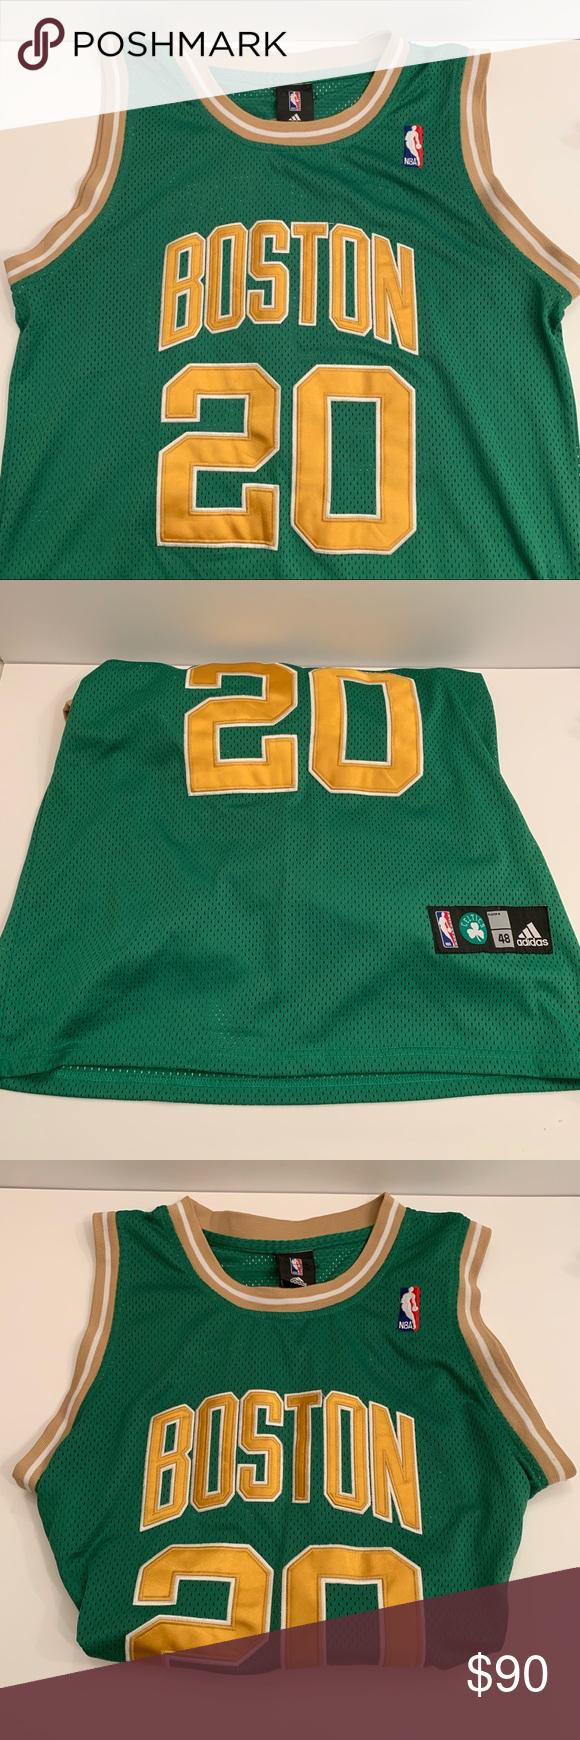 Adidas Authentic Boston Celtics Ray Allen Jersey M Clothes Design Boston Celtics Adidas Shirt